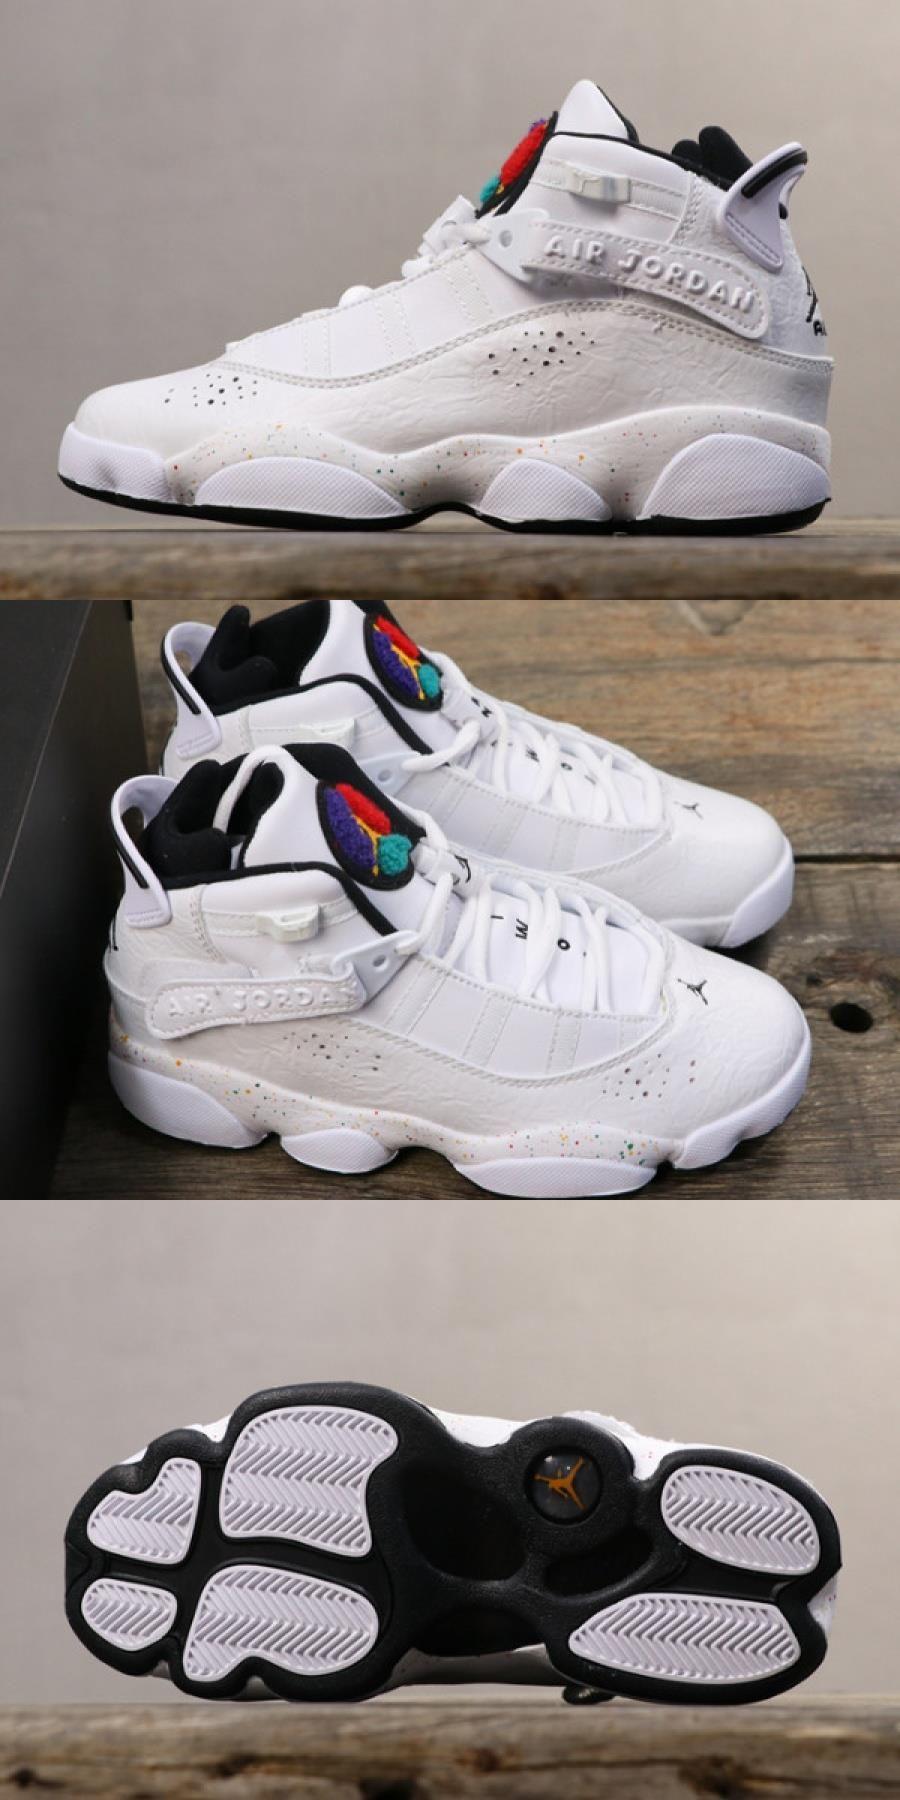 "2020 的 Women's Air Jordan 6 Rings ""confetti"" White/black"